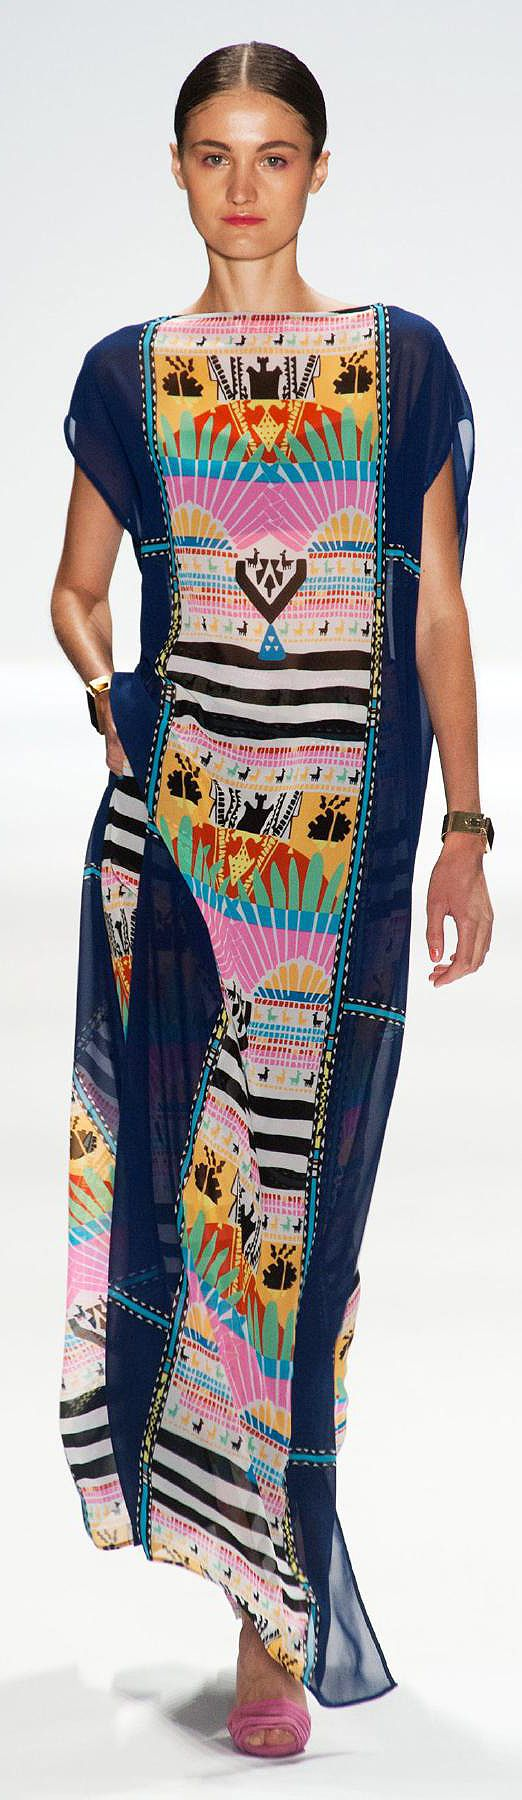 best summer time fashion images on pinterest